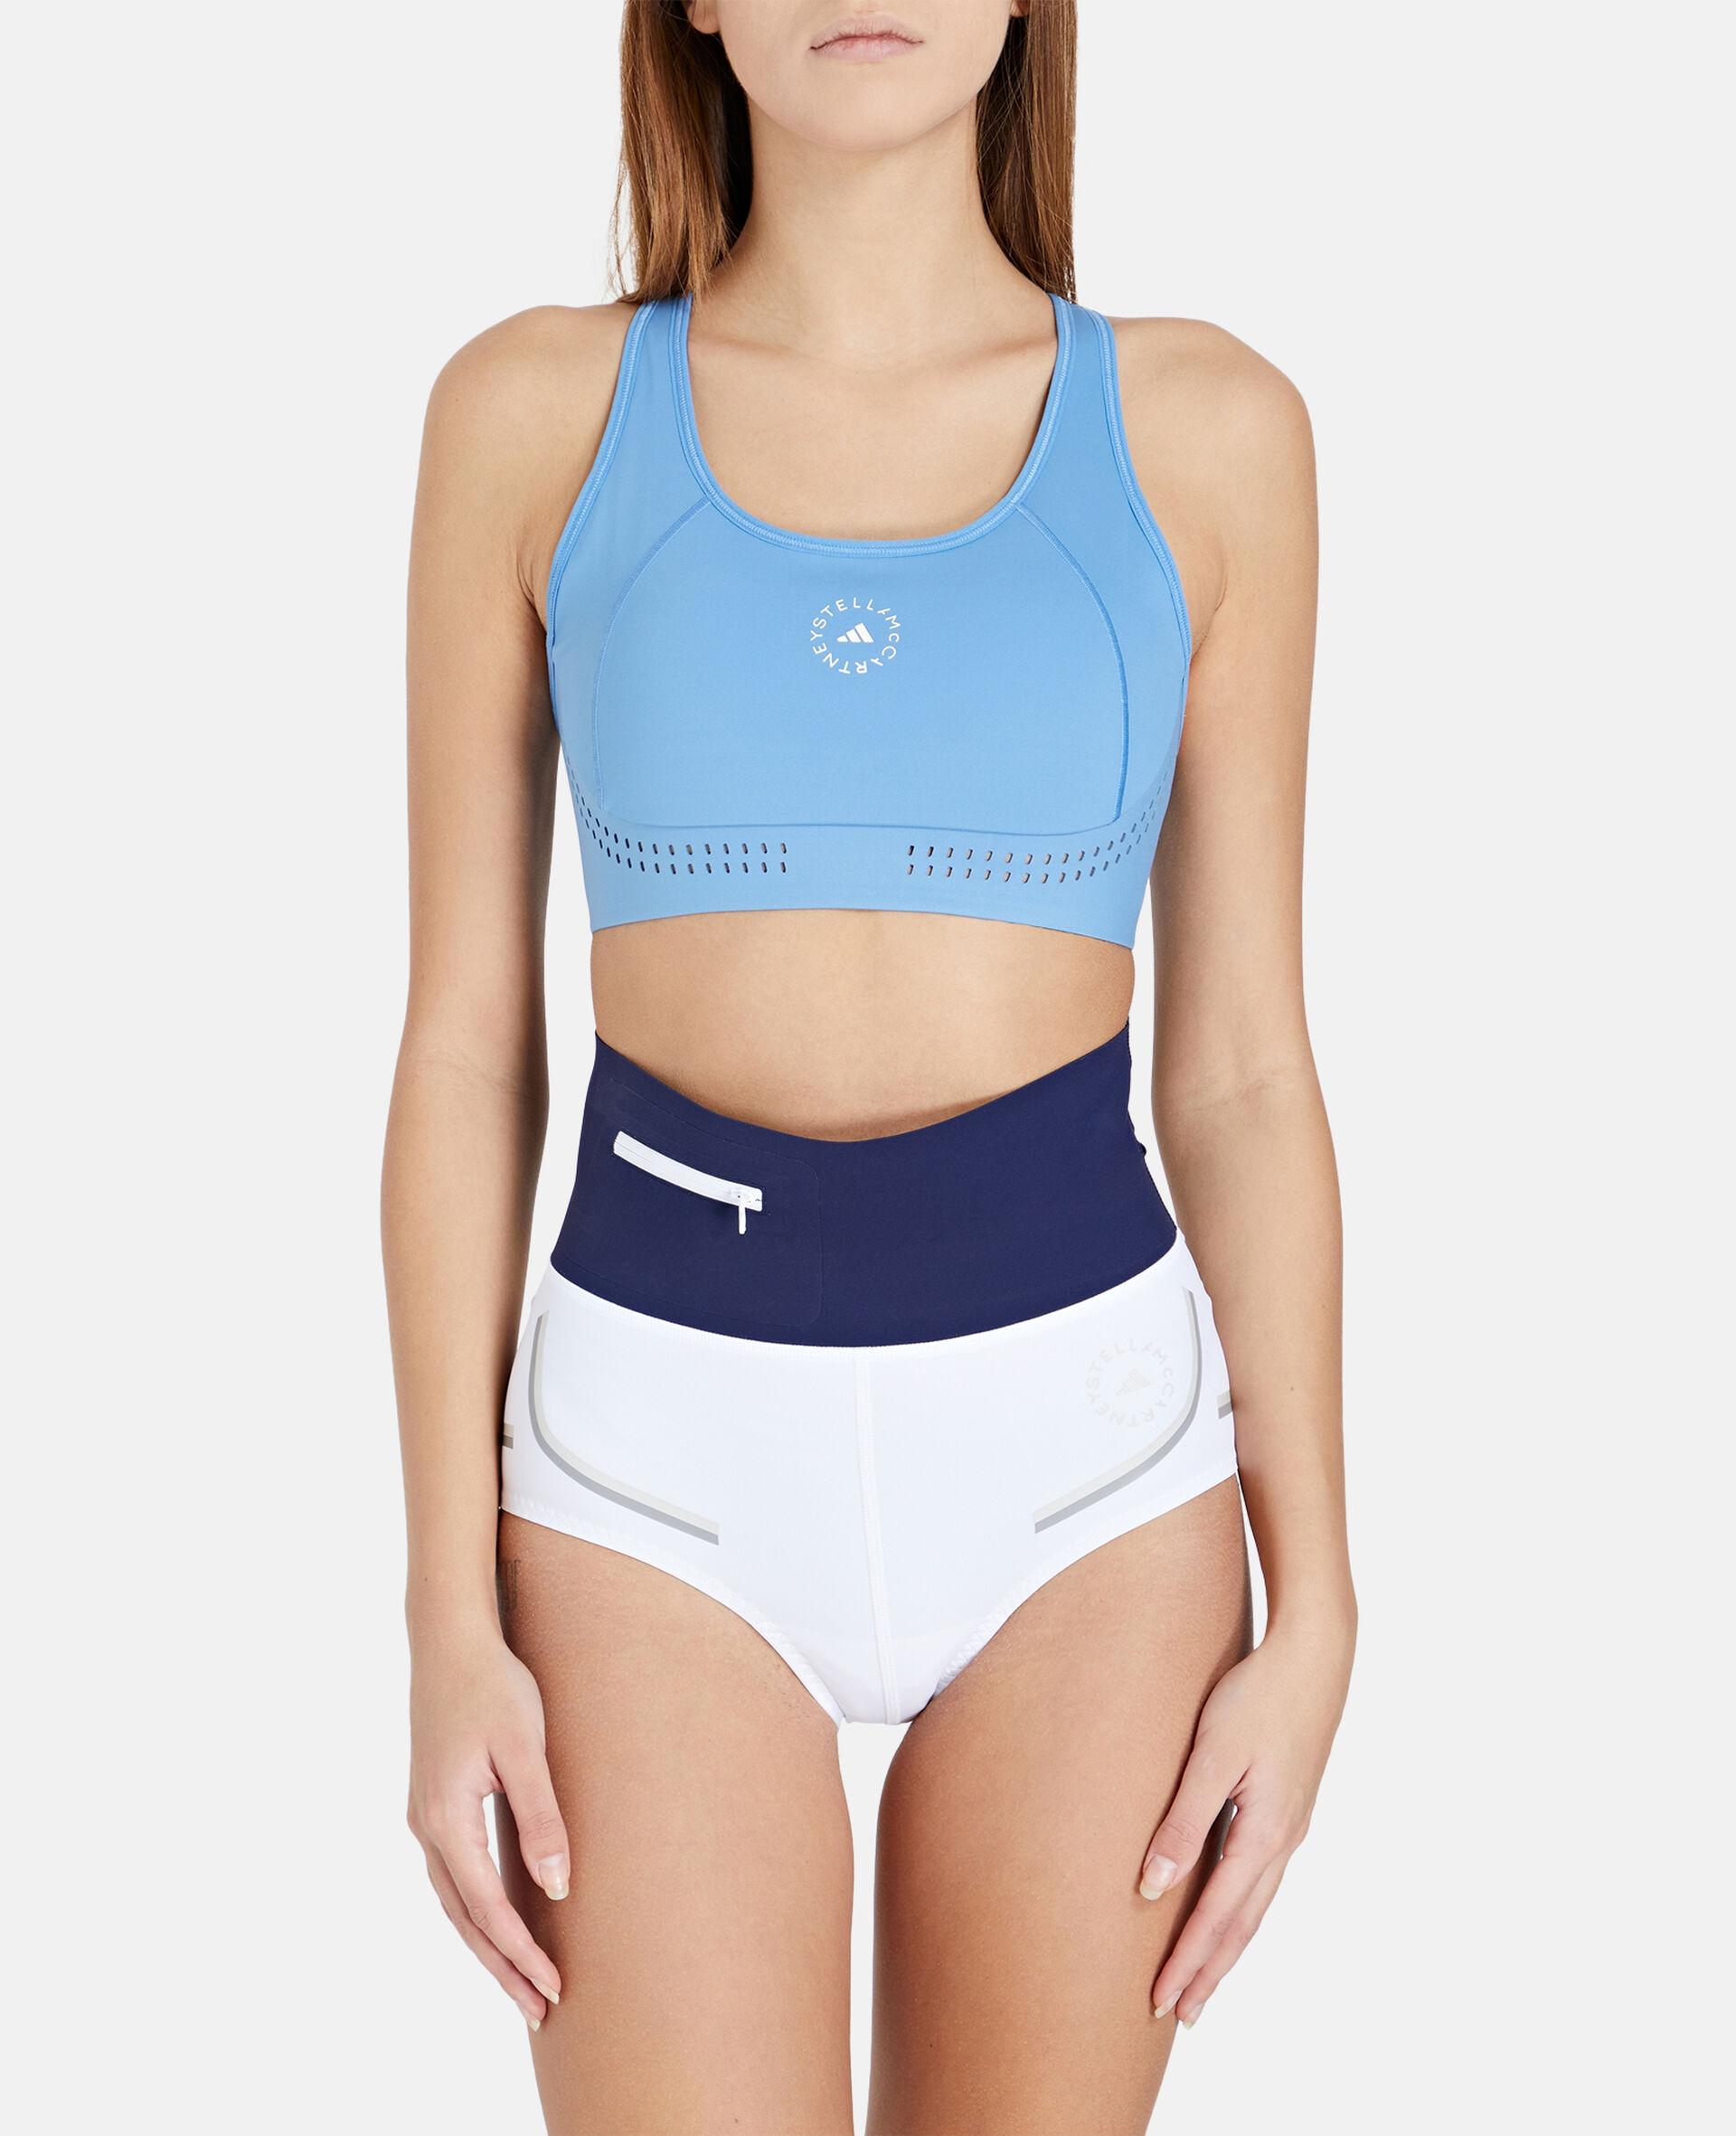 White Beach Defender Bikini Shorts-White-large image number 1